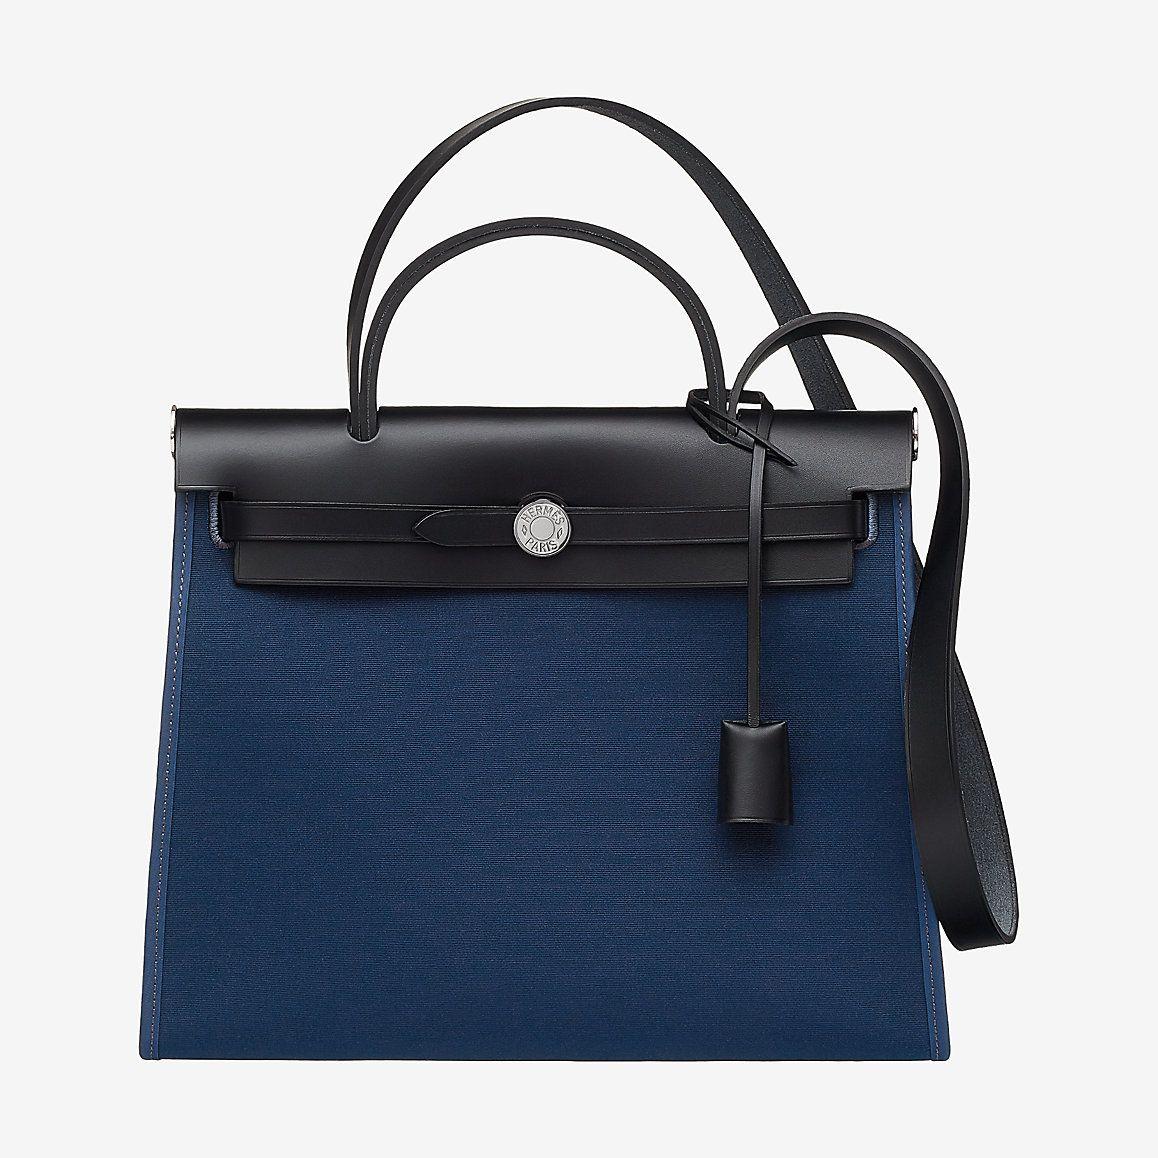 60b1af2e6998 Herbag Zip 31 bag - H060300CKCA -- Blue de Malte Noir